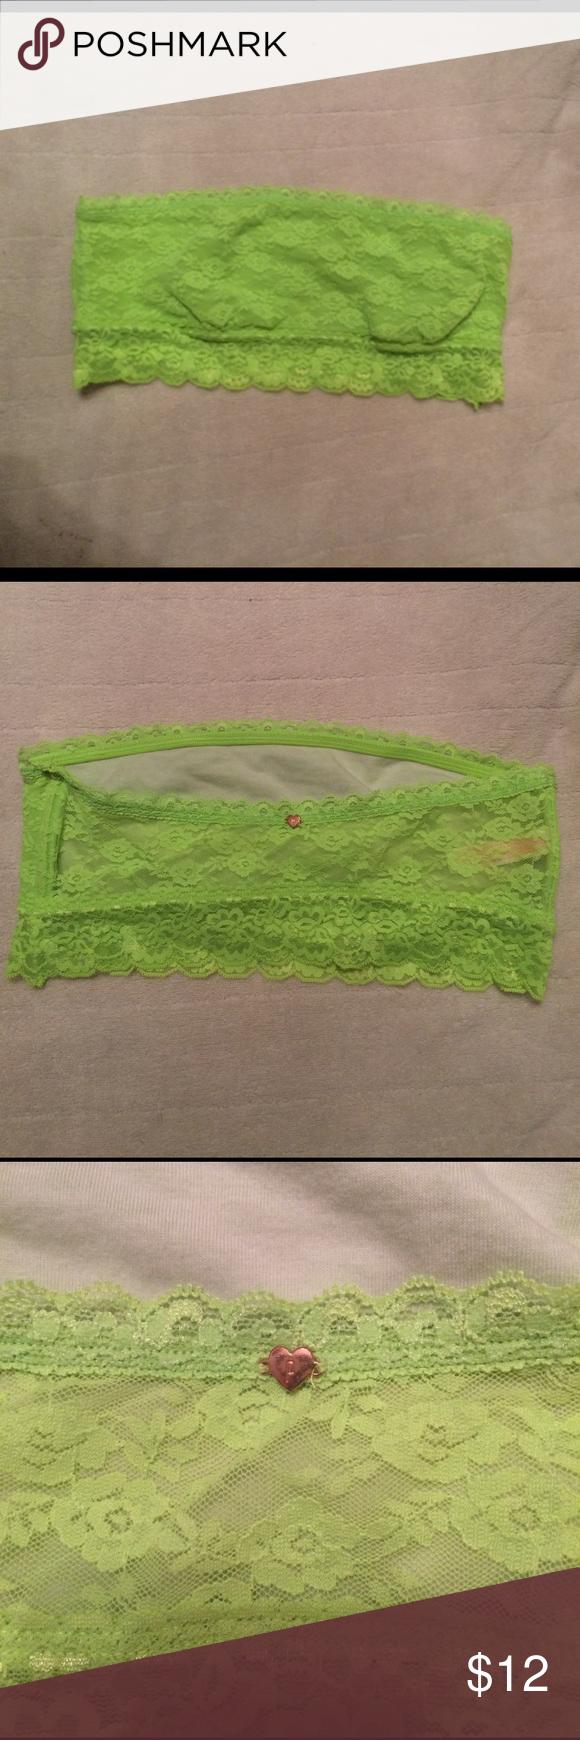 Pink Victoria's Secret bandeau. Like new Pink VS bright lime green bandeau. Intimates & Sleepwear Bandeaus